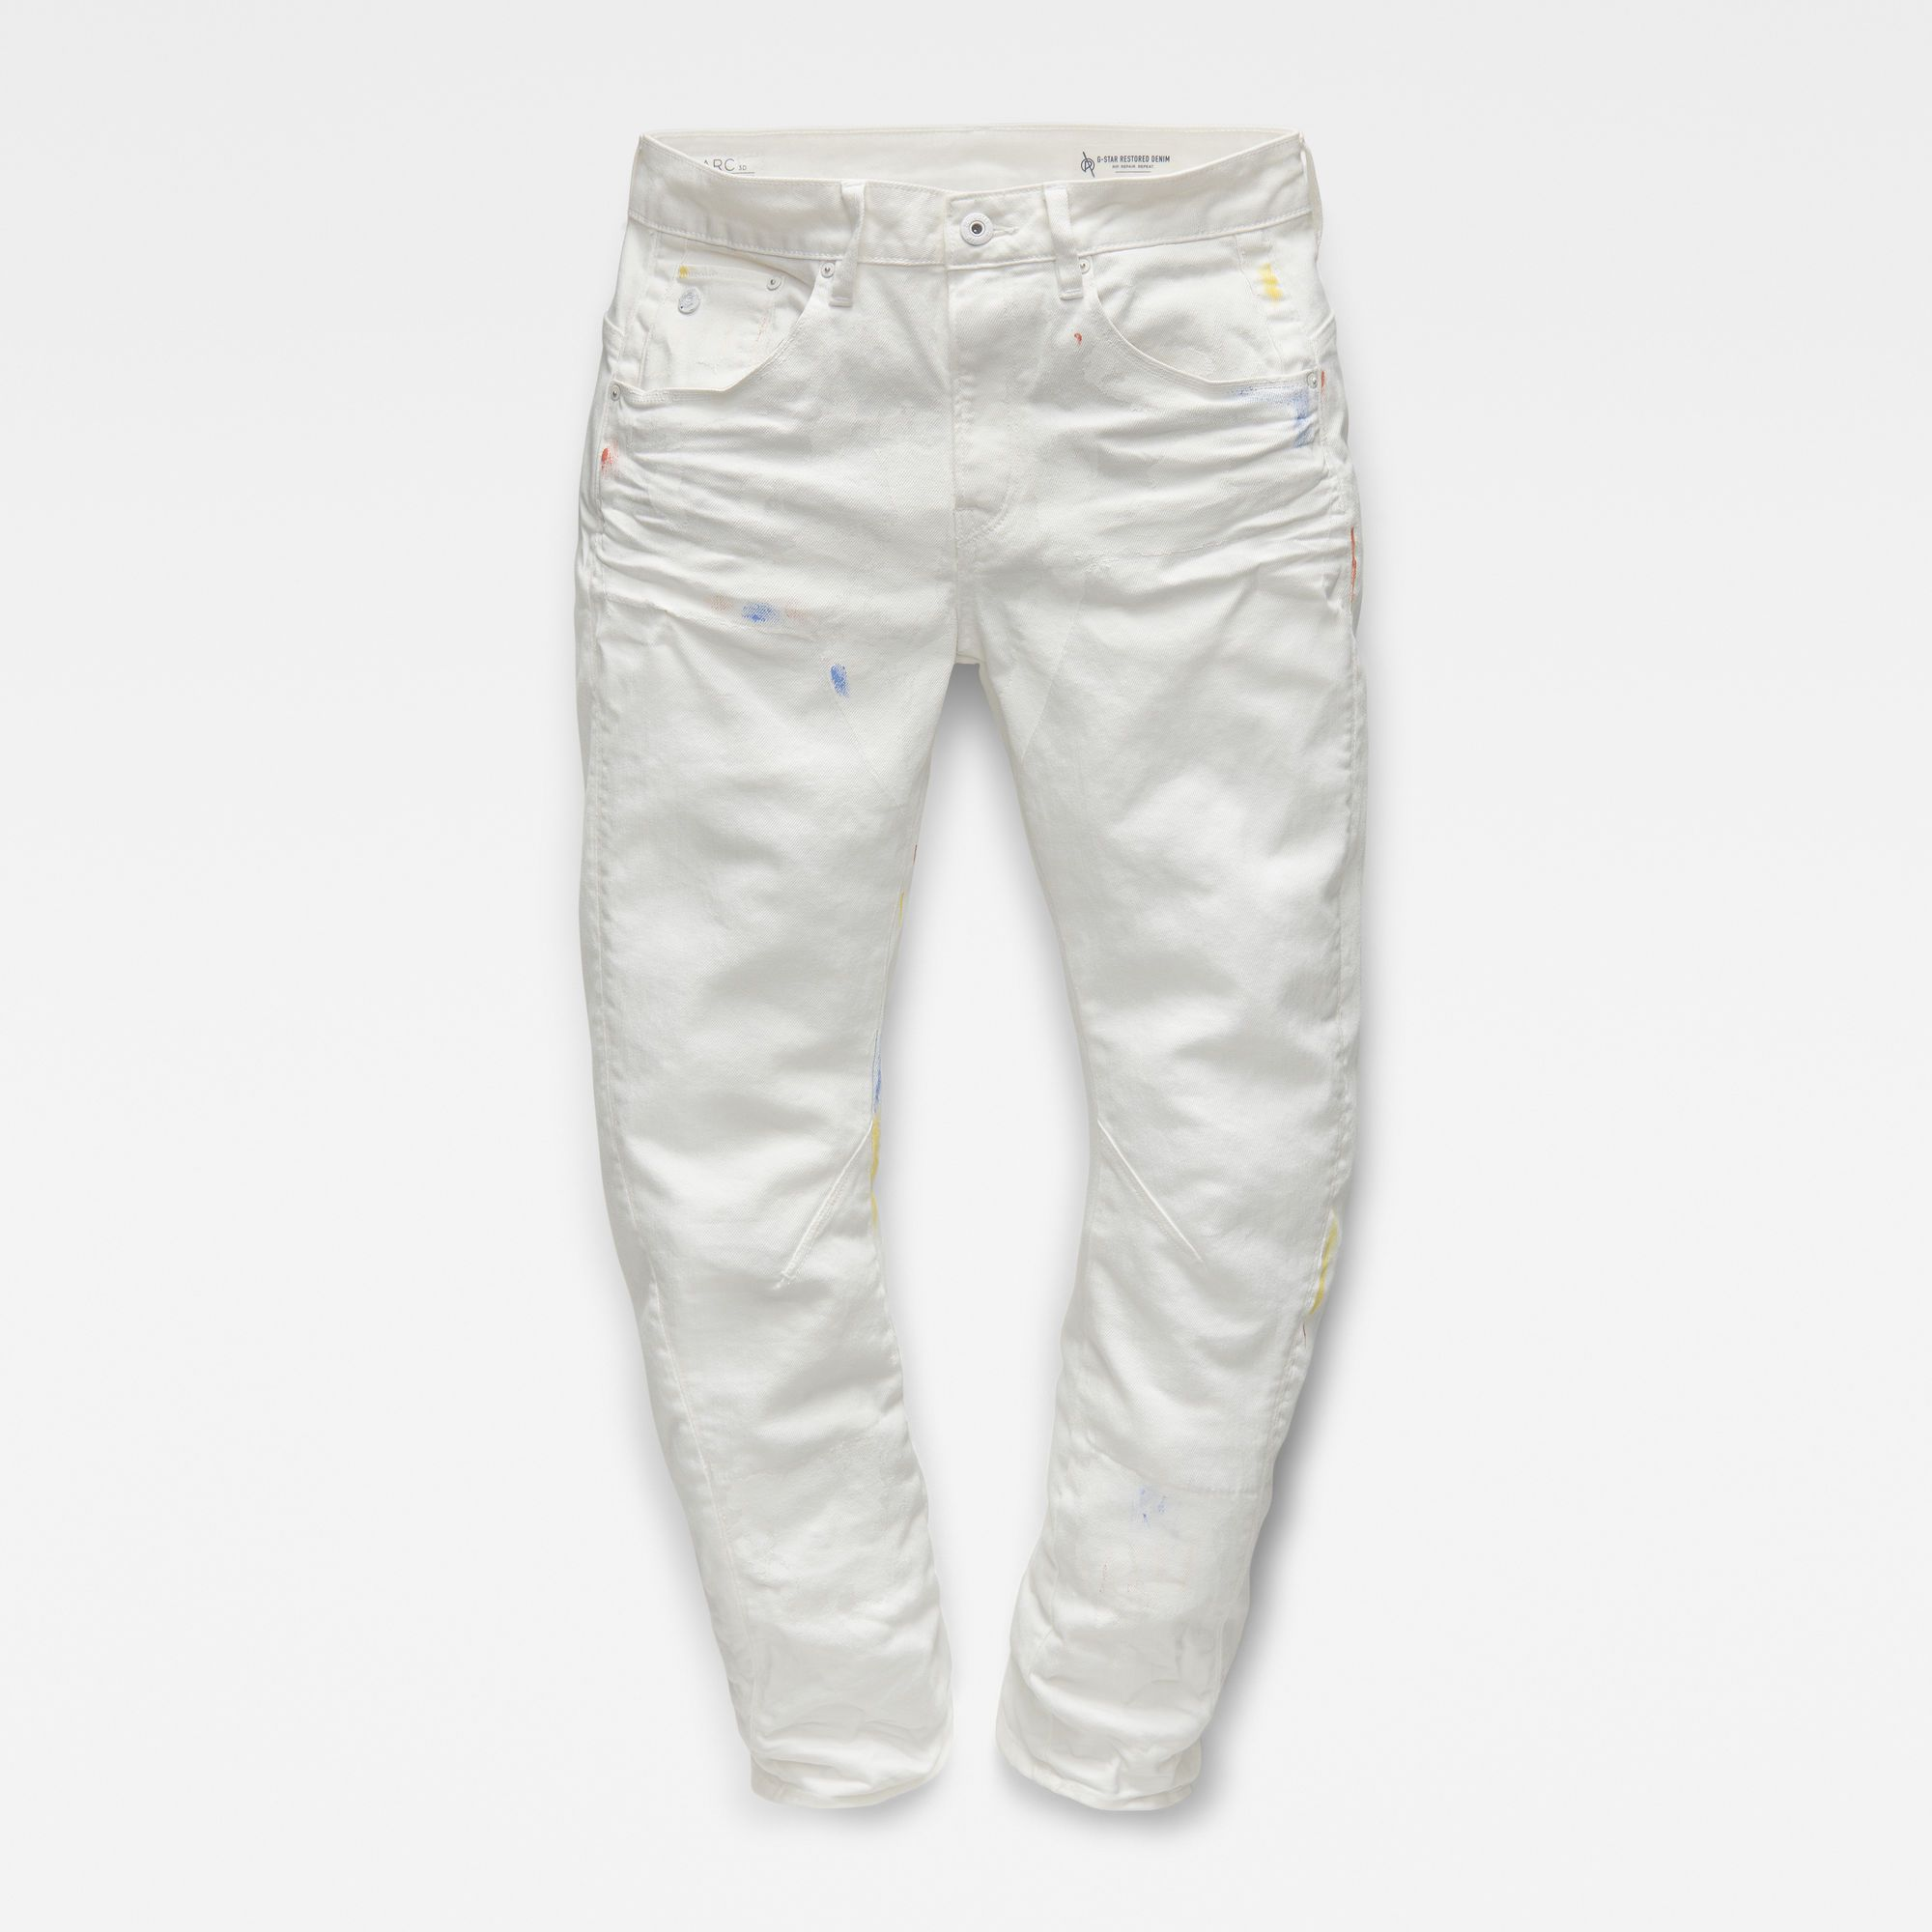 G-Star RAW Arc 3D Mid Waist Boyfriend 7/8 Jeans